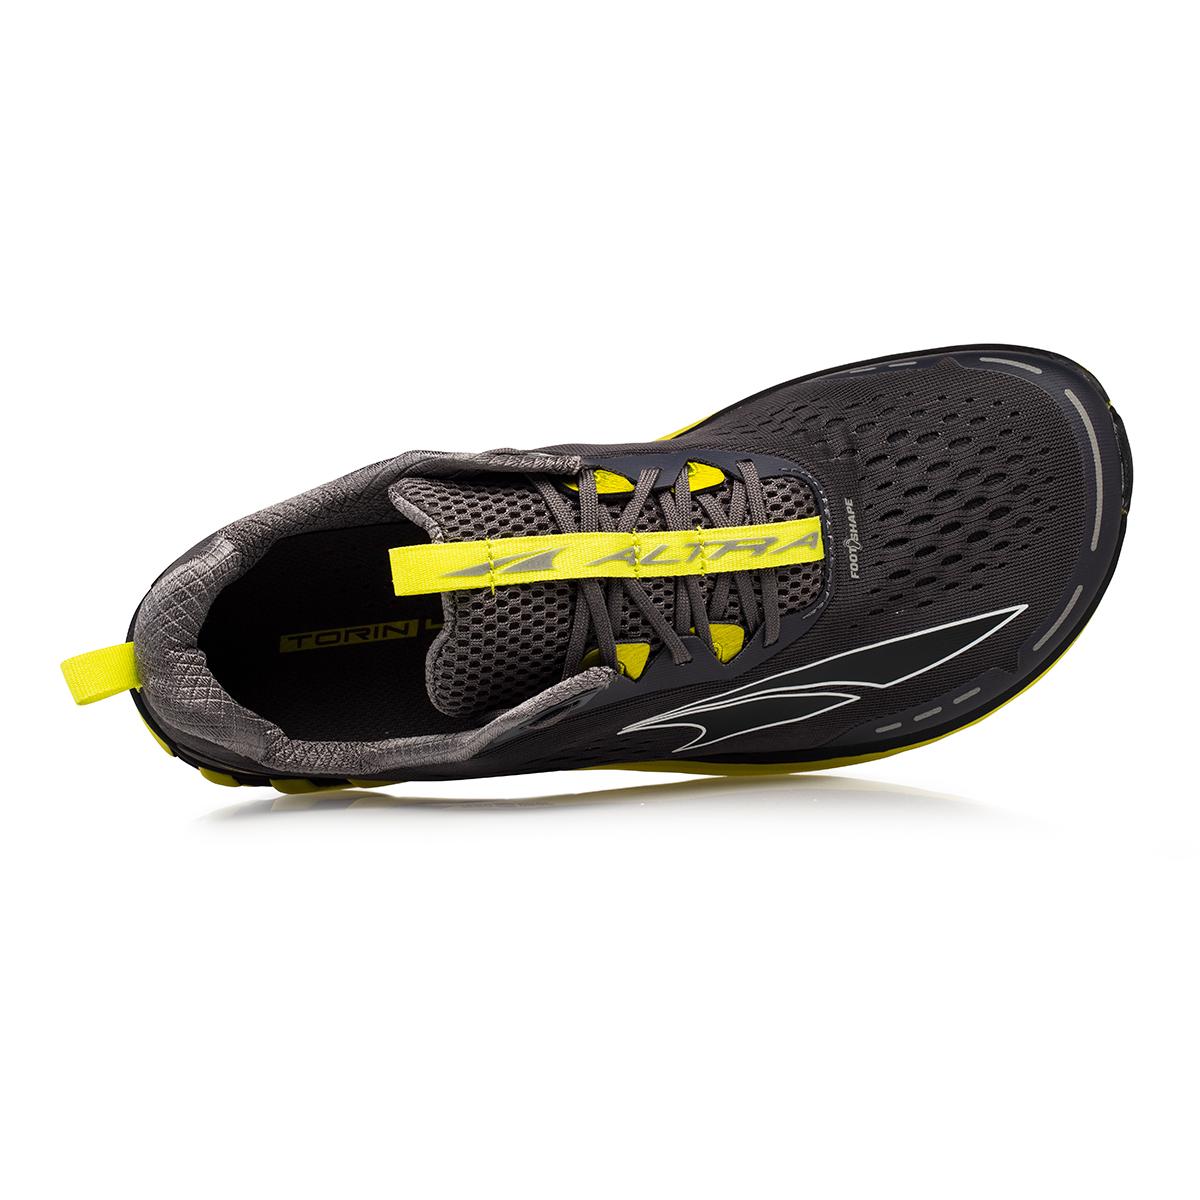 Men's Altra Torin 4 Running Shoe - Color: Gray/Lime - Size: 7 - Width: Regular, Gray/Lime, large, image 2